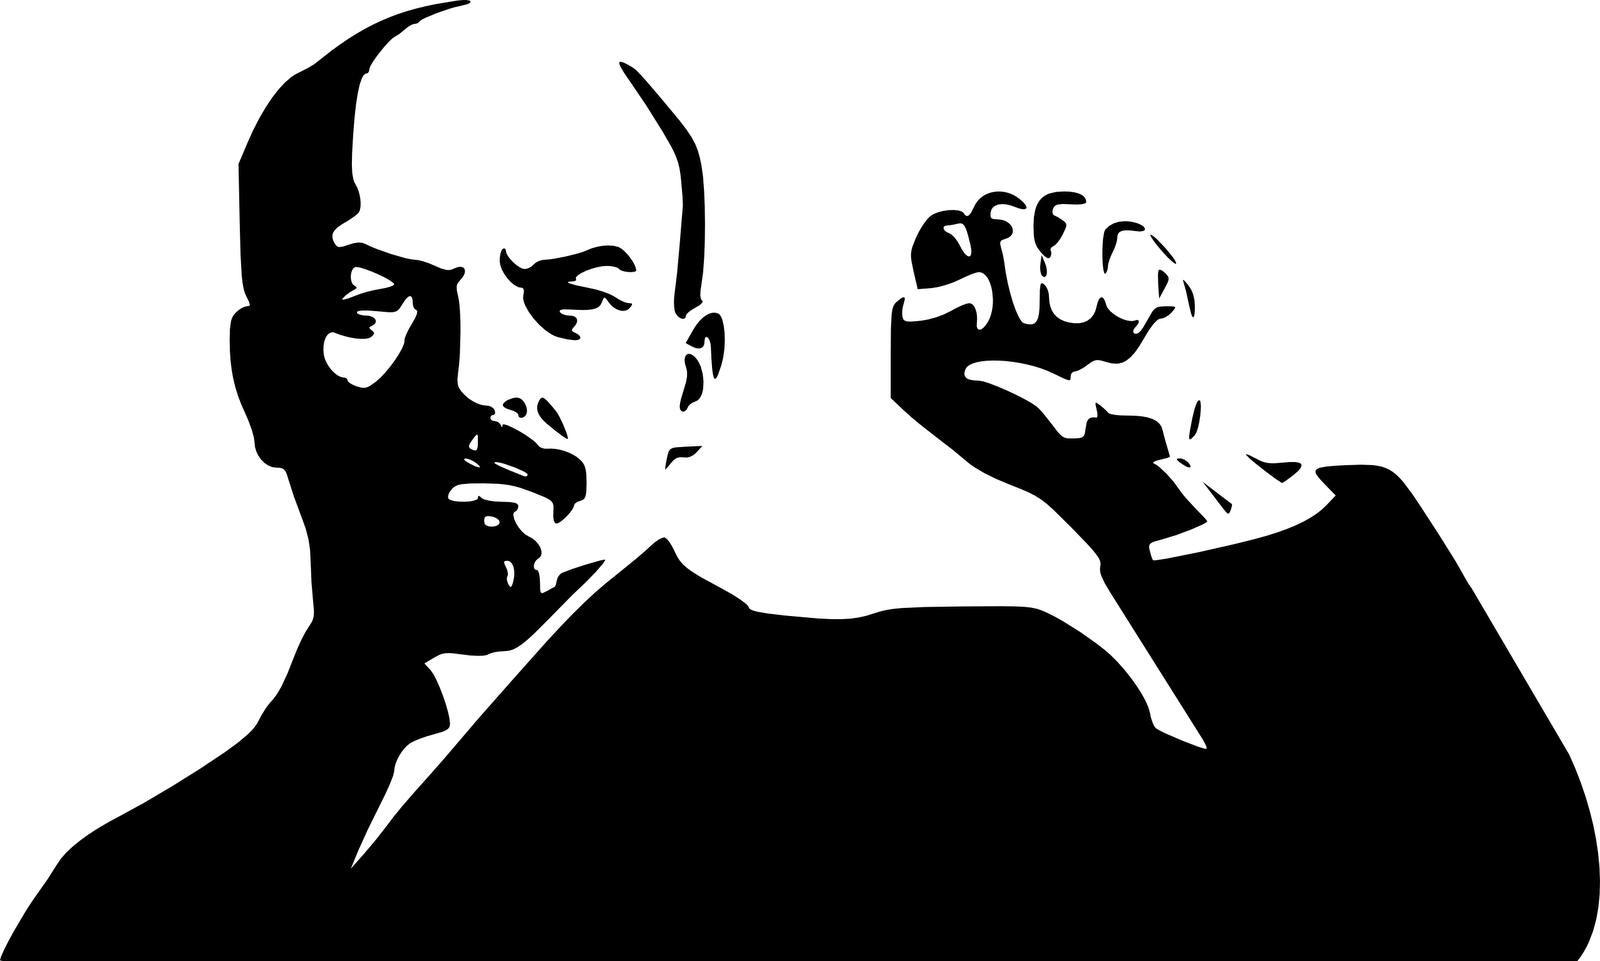 Vladimir Ilitch Lenin, o professor